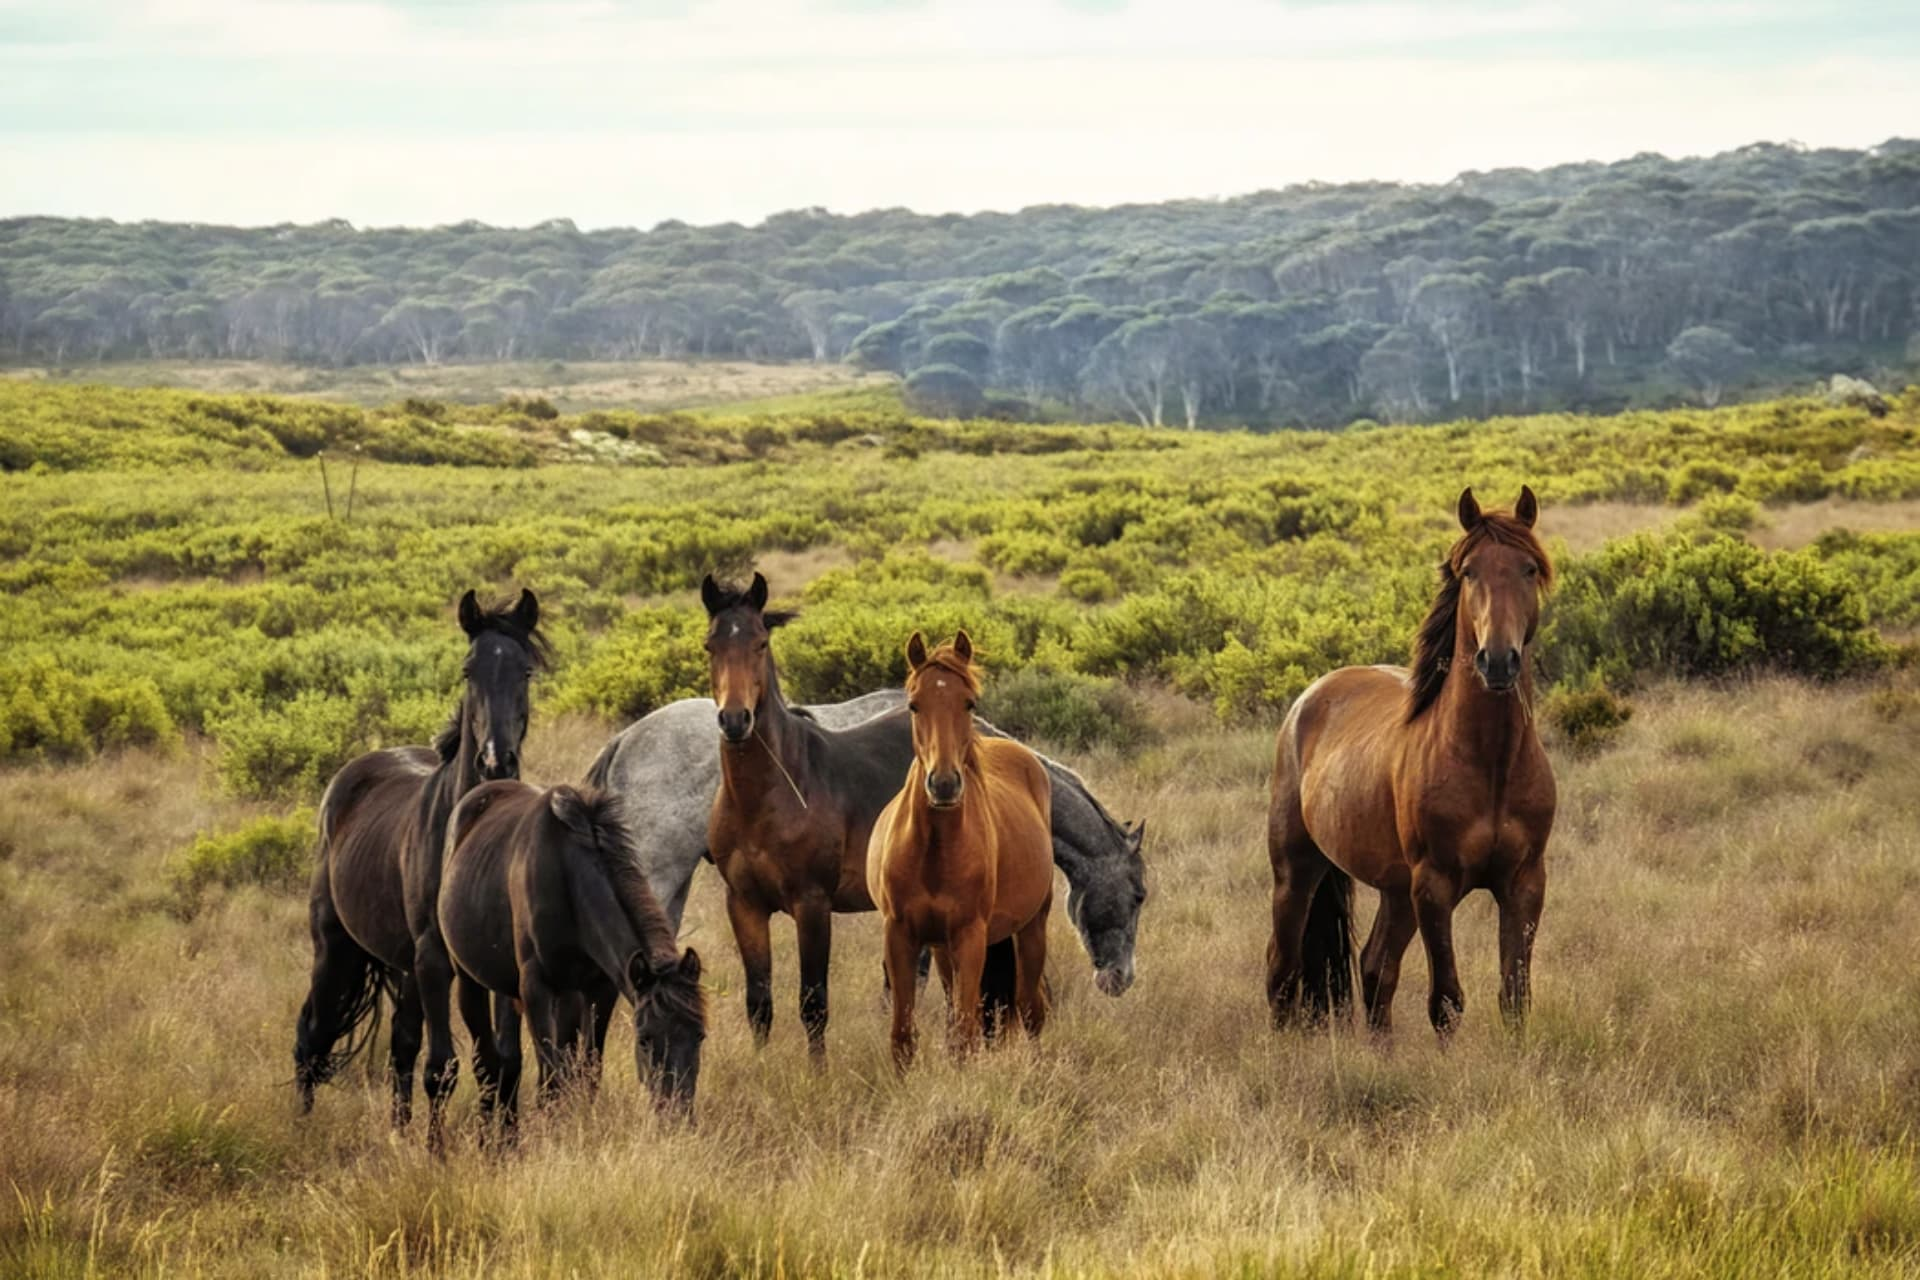 Genteel Care of the Equine